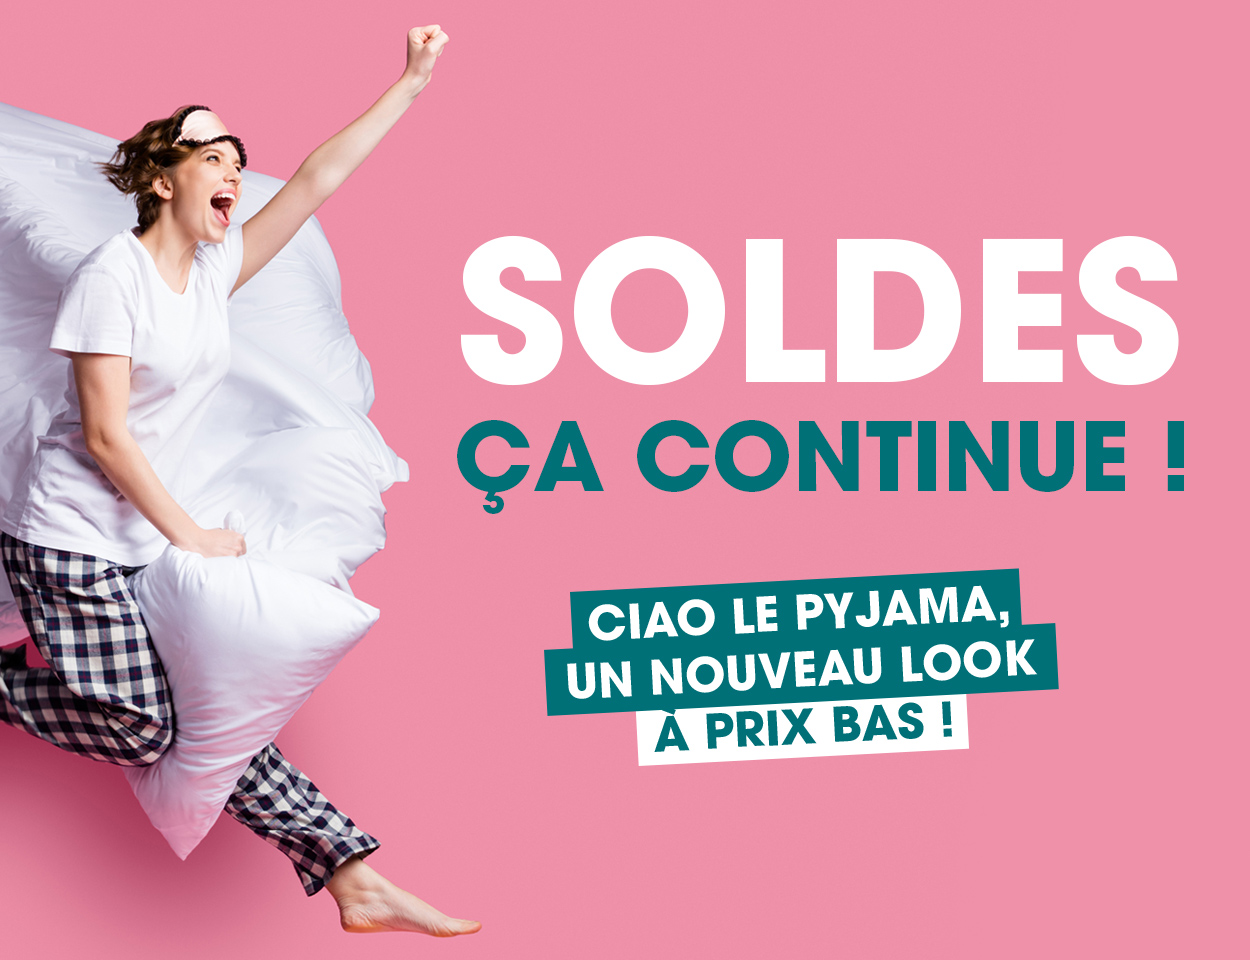 SOLDES : CA CONTINUE !!